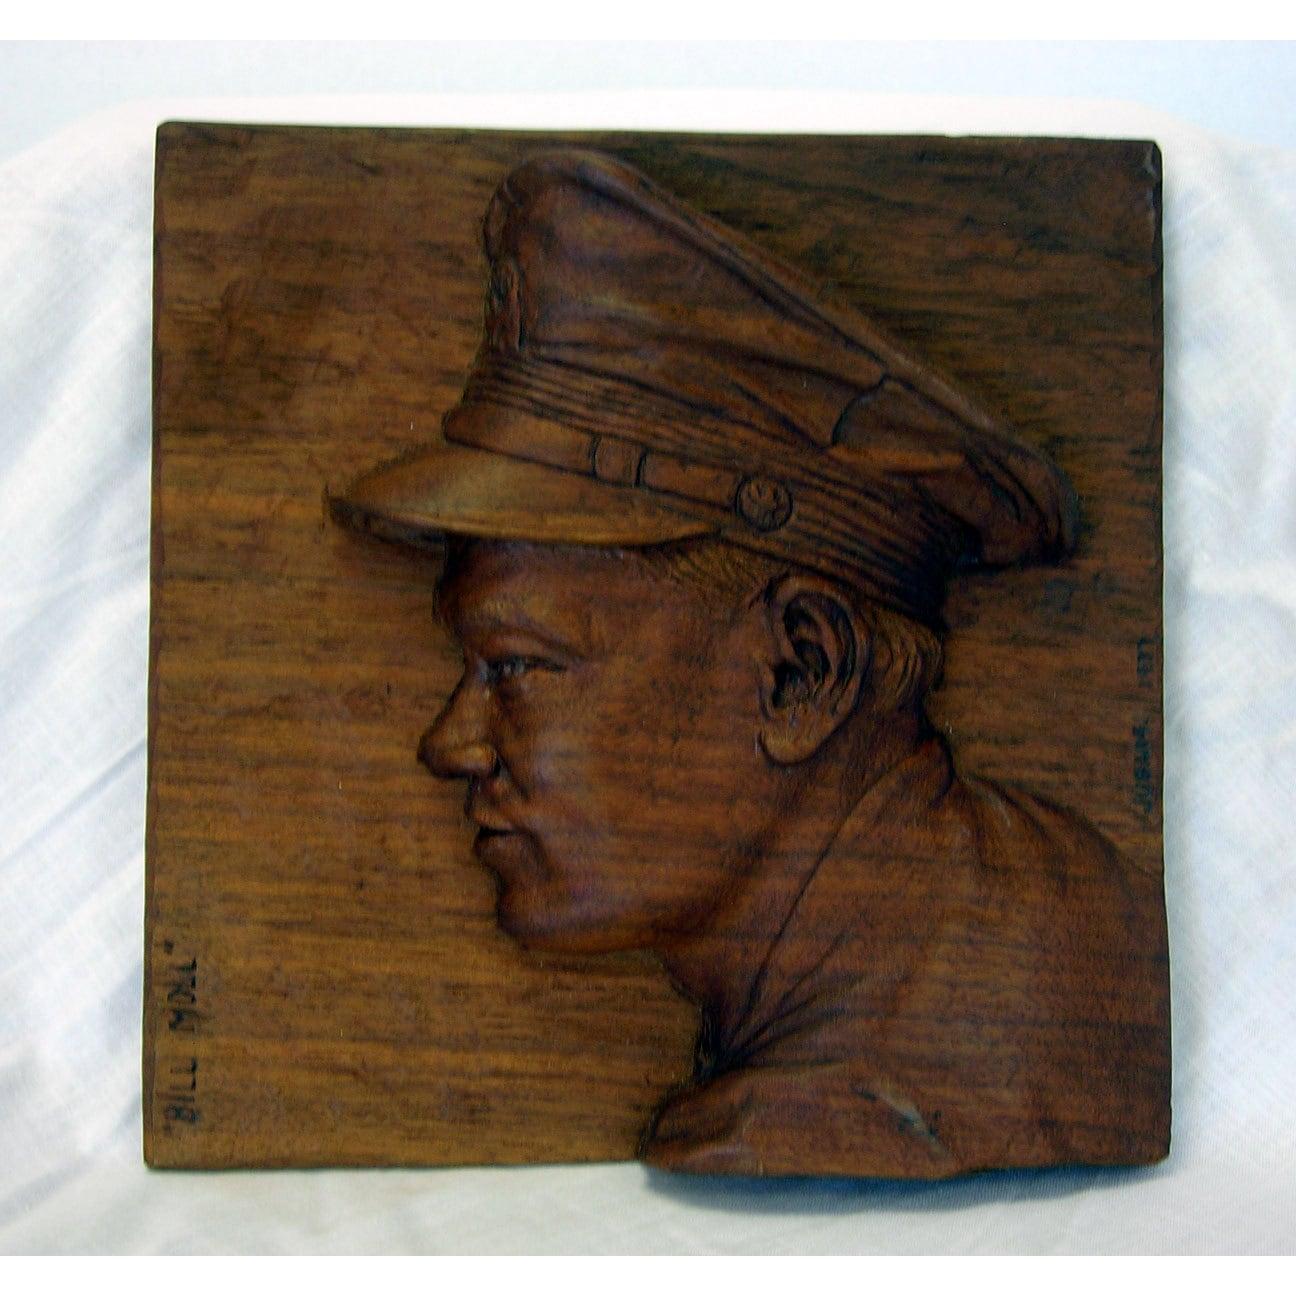 Walnut folk art bas relief figural carving portrait by